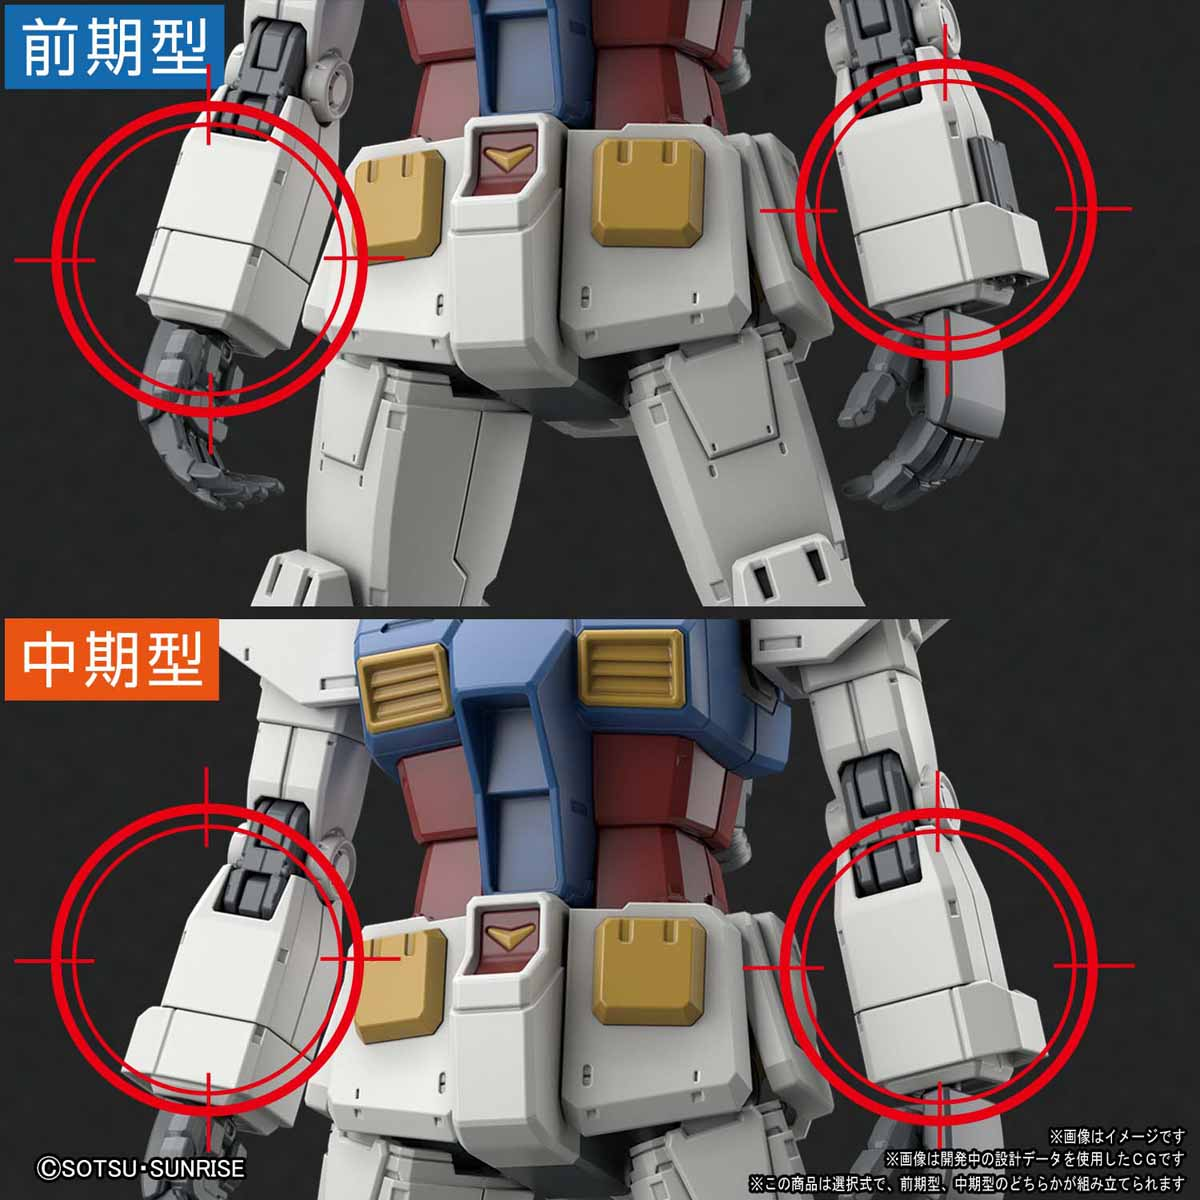 HG 1/144『RX-78-02 ガンダム(GUNDAM THE ORIGIN版)』プラモデル-006